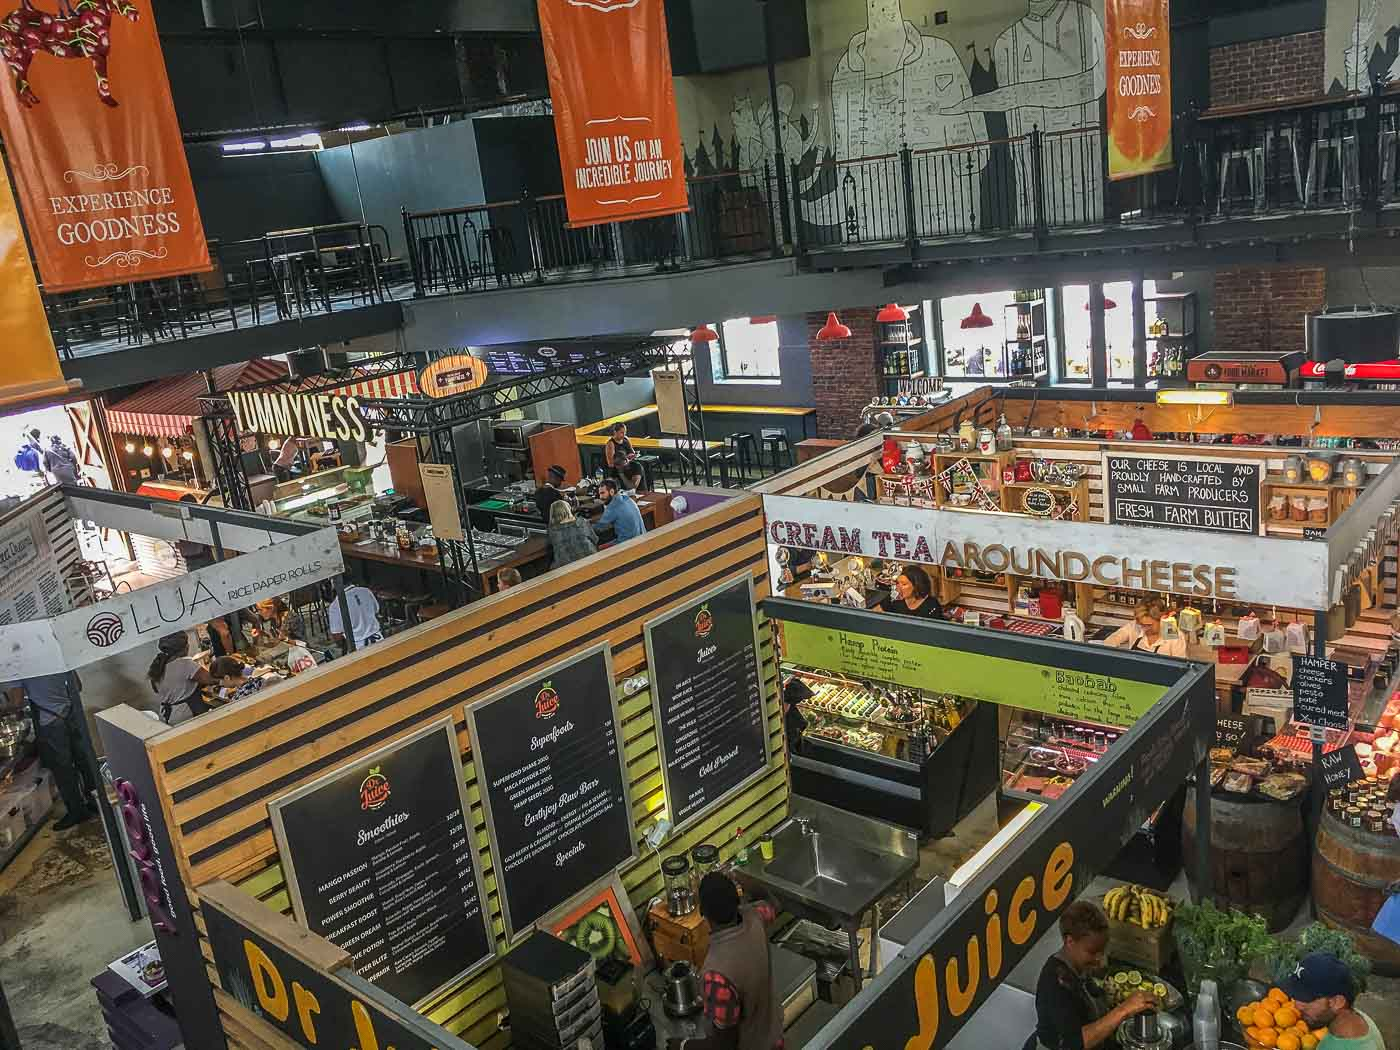 V & A Food Market